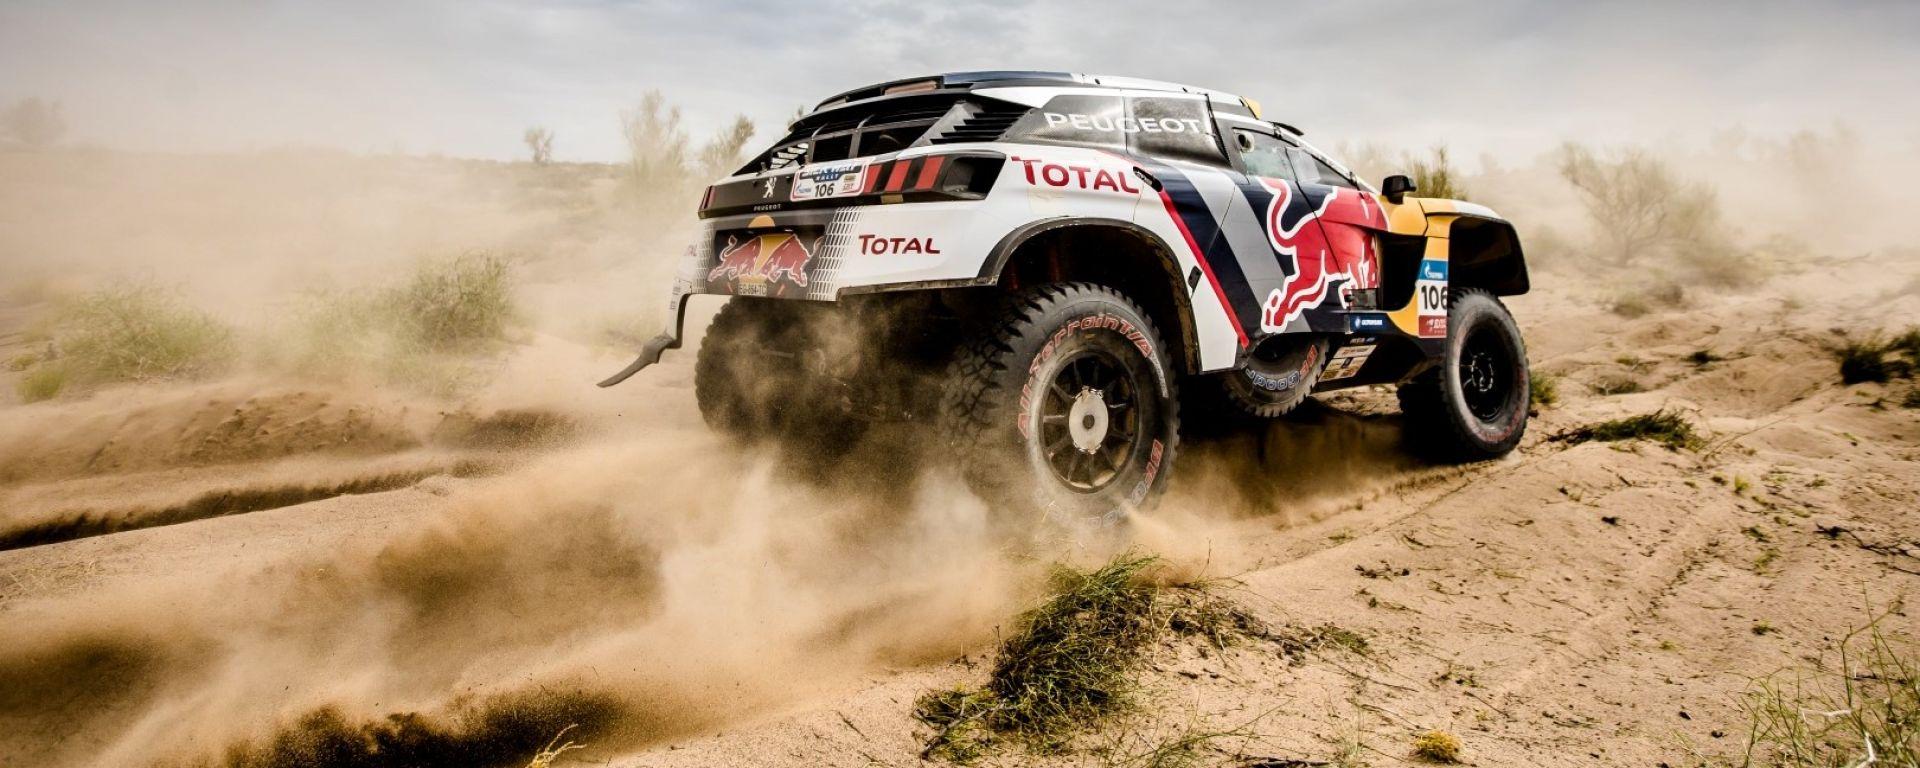 Peugeot 3008 DKR vincitrice del Silk Way Rally 2017